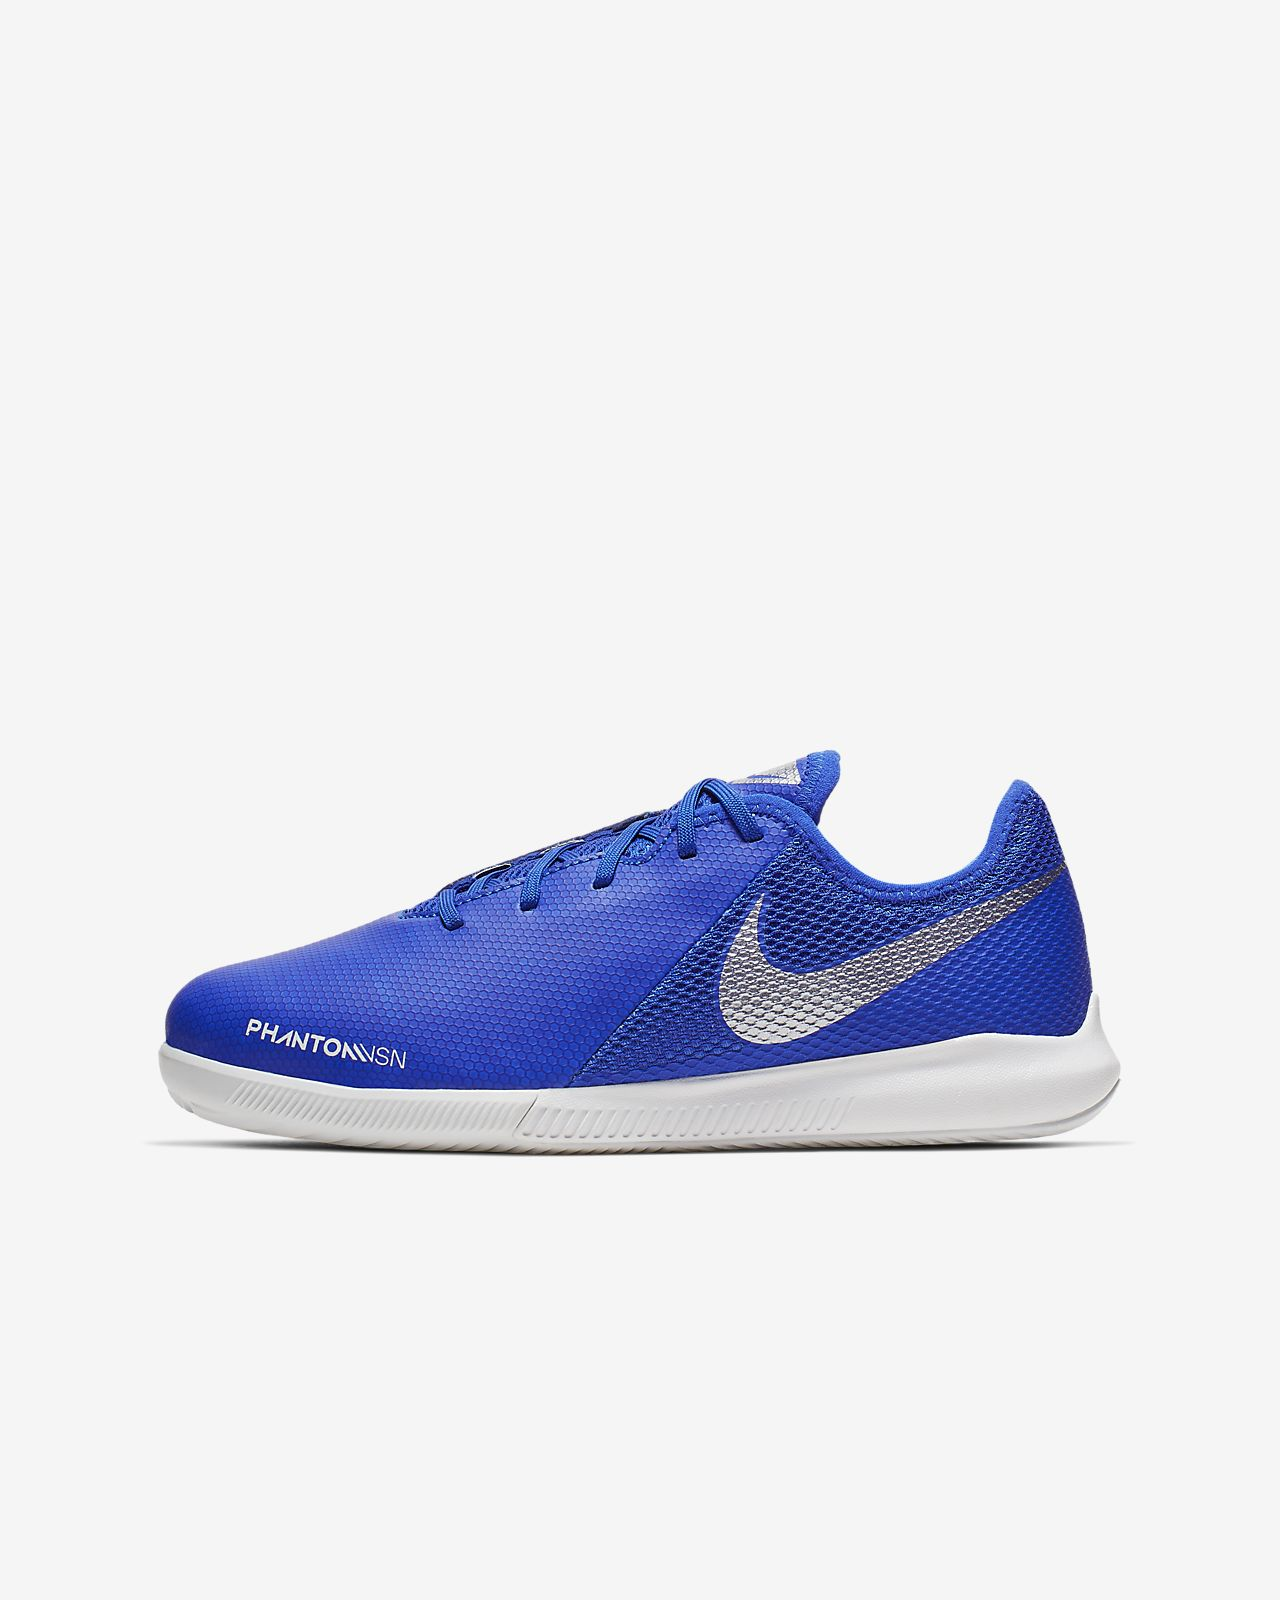 Scarpa da calcio per campo indoor/cemento Nike Jr. Phantom Vision Academy IC - Bambini/Ragazzi